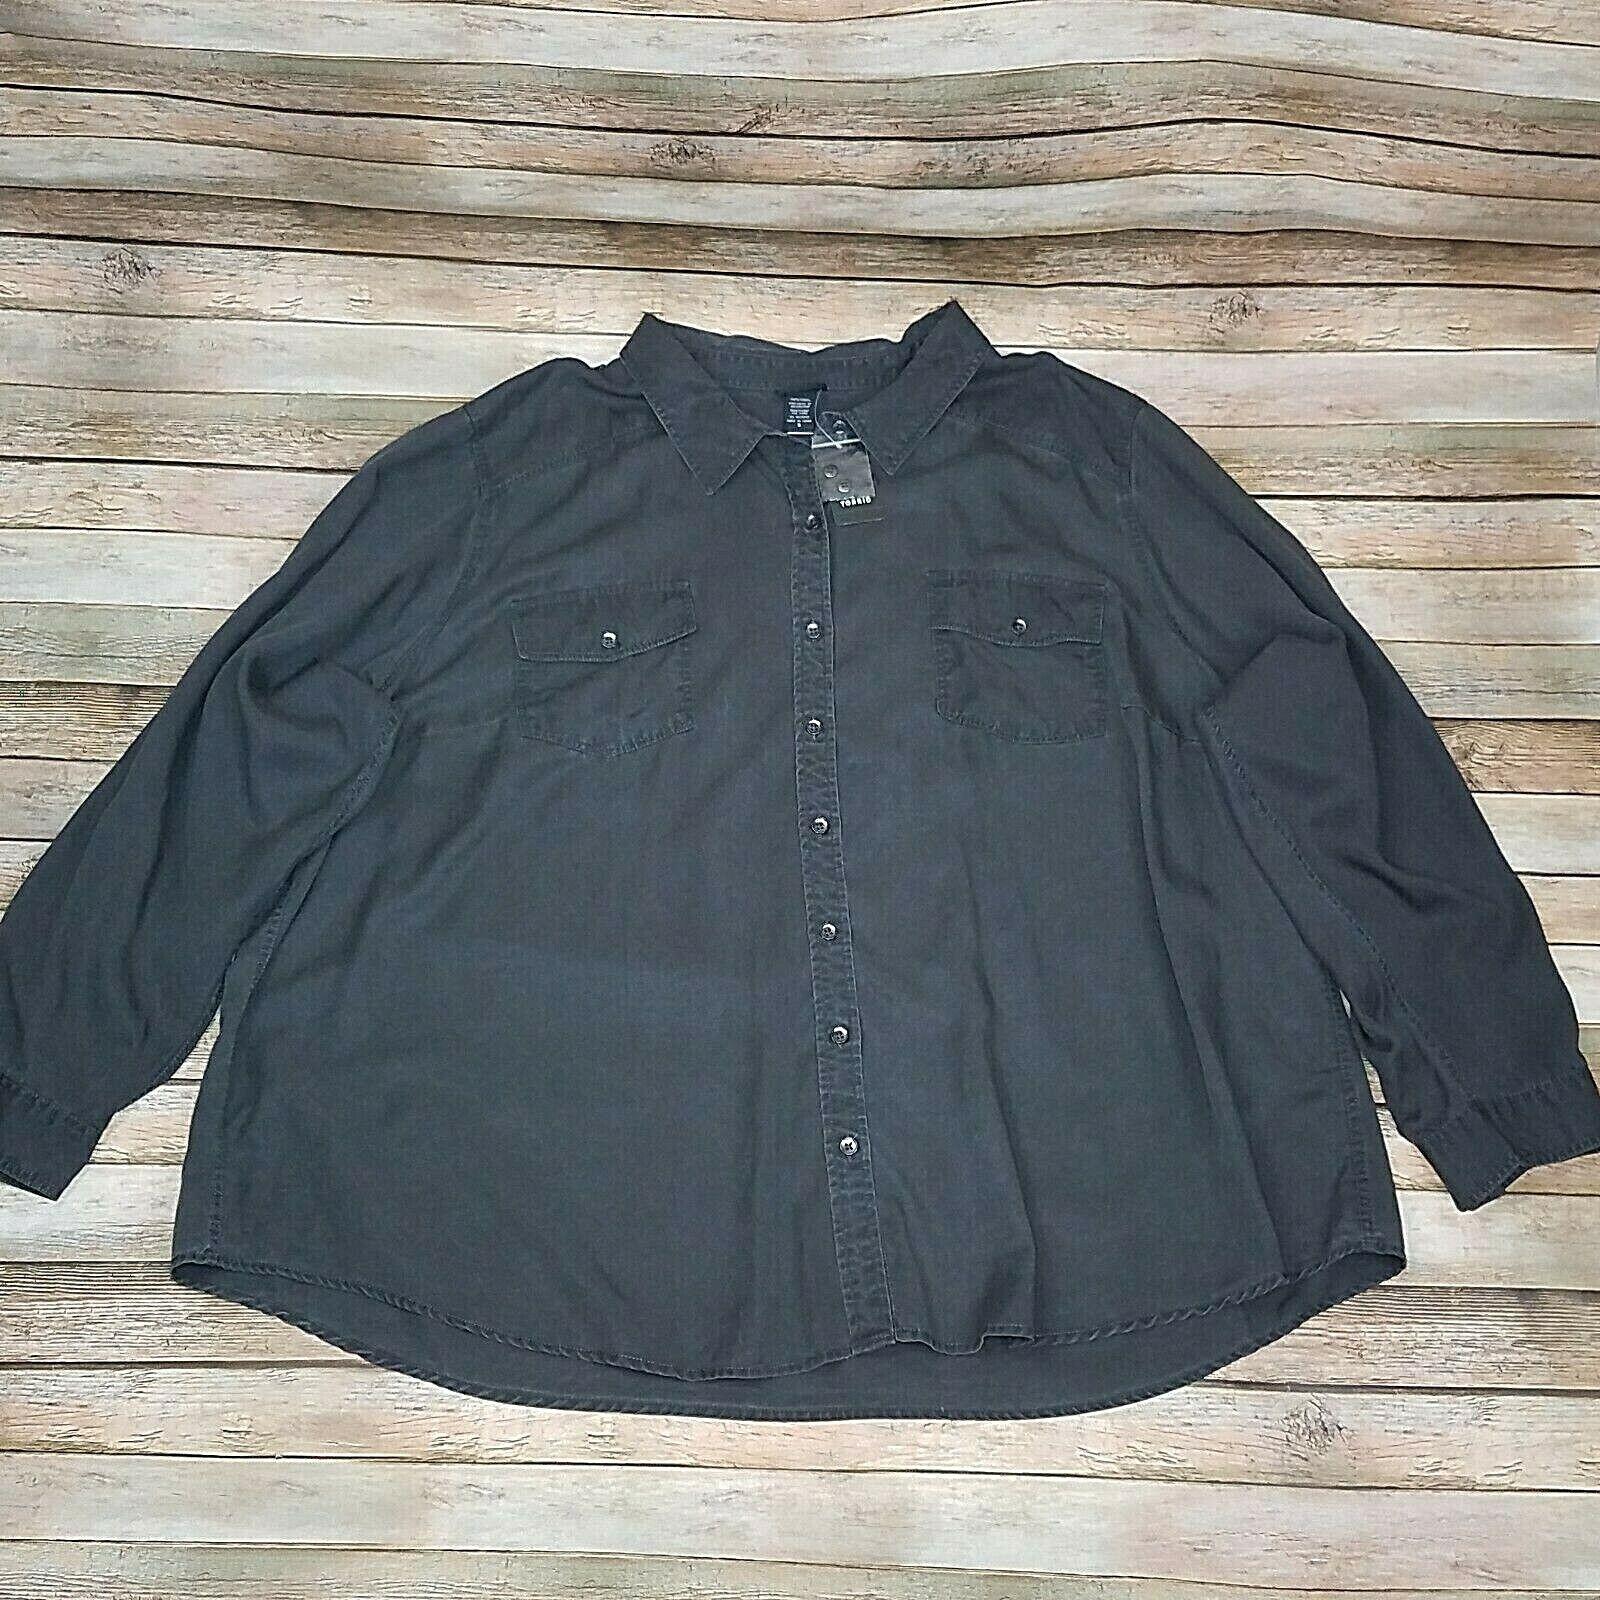 Torrid 100% Tencel Grey Camp Shirt Size 5